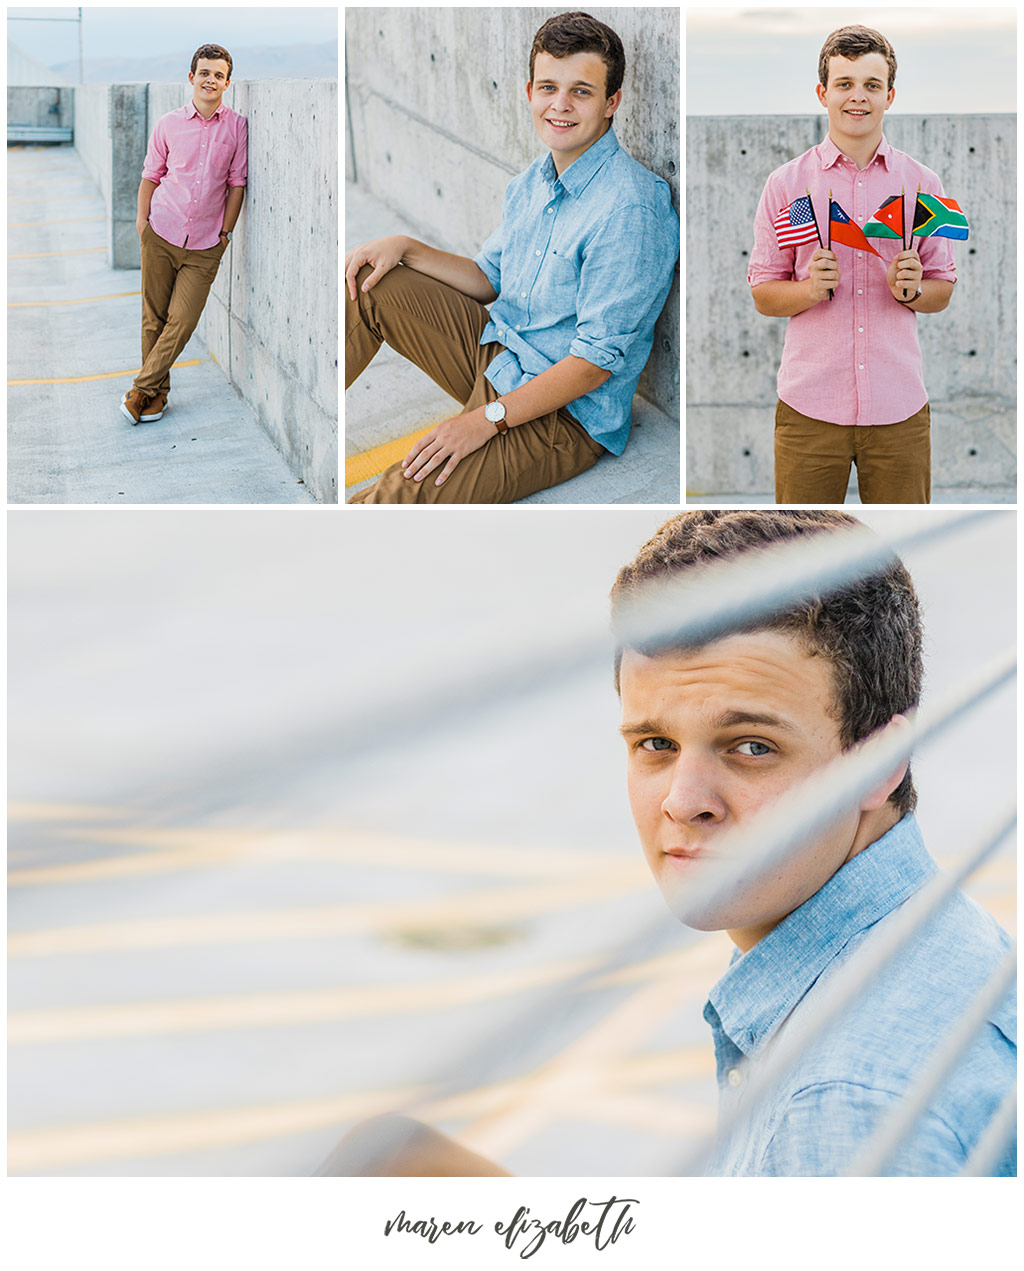 UVU boy senior pictures by Maren Elizabeth Photography taken on the top level of the Utah Valley University parking garage. | Arizona Senior Photographer